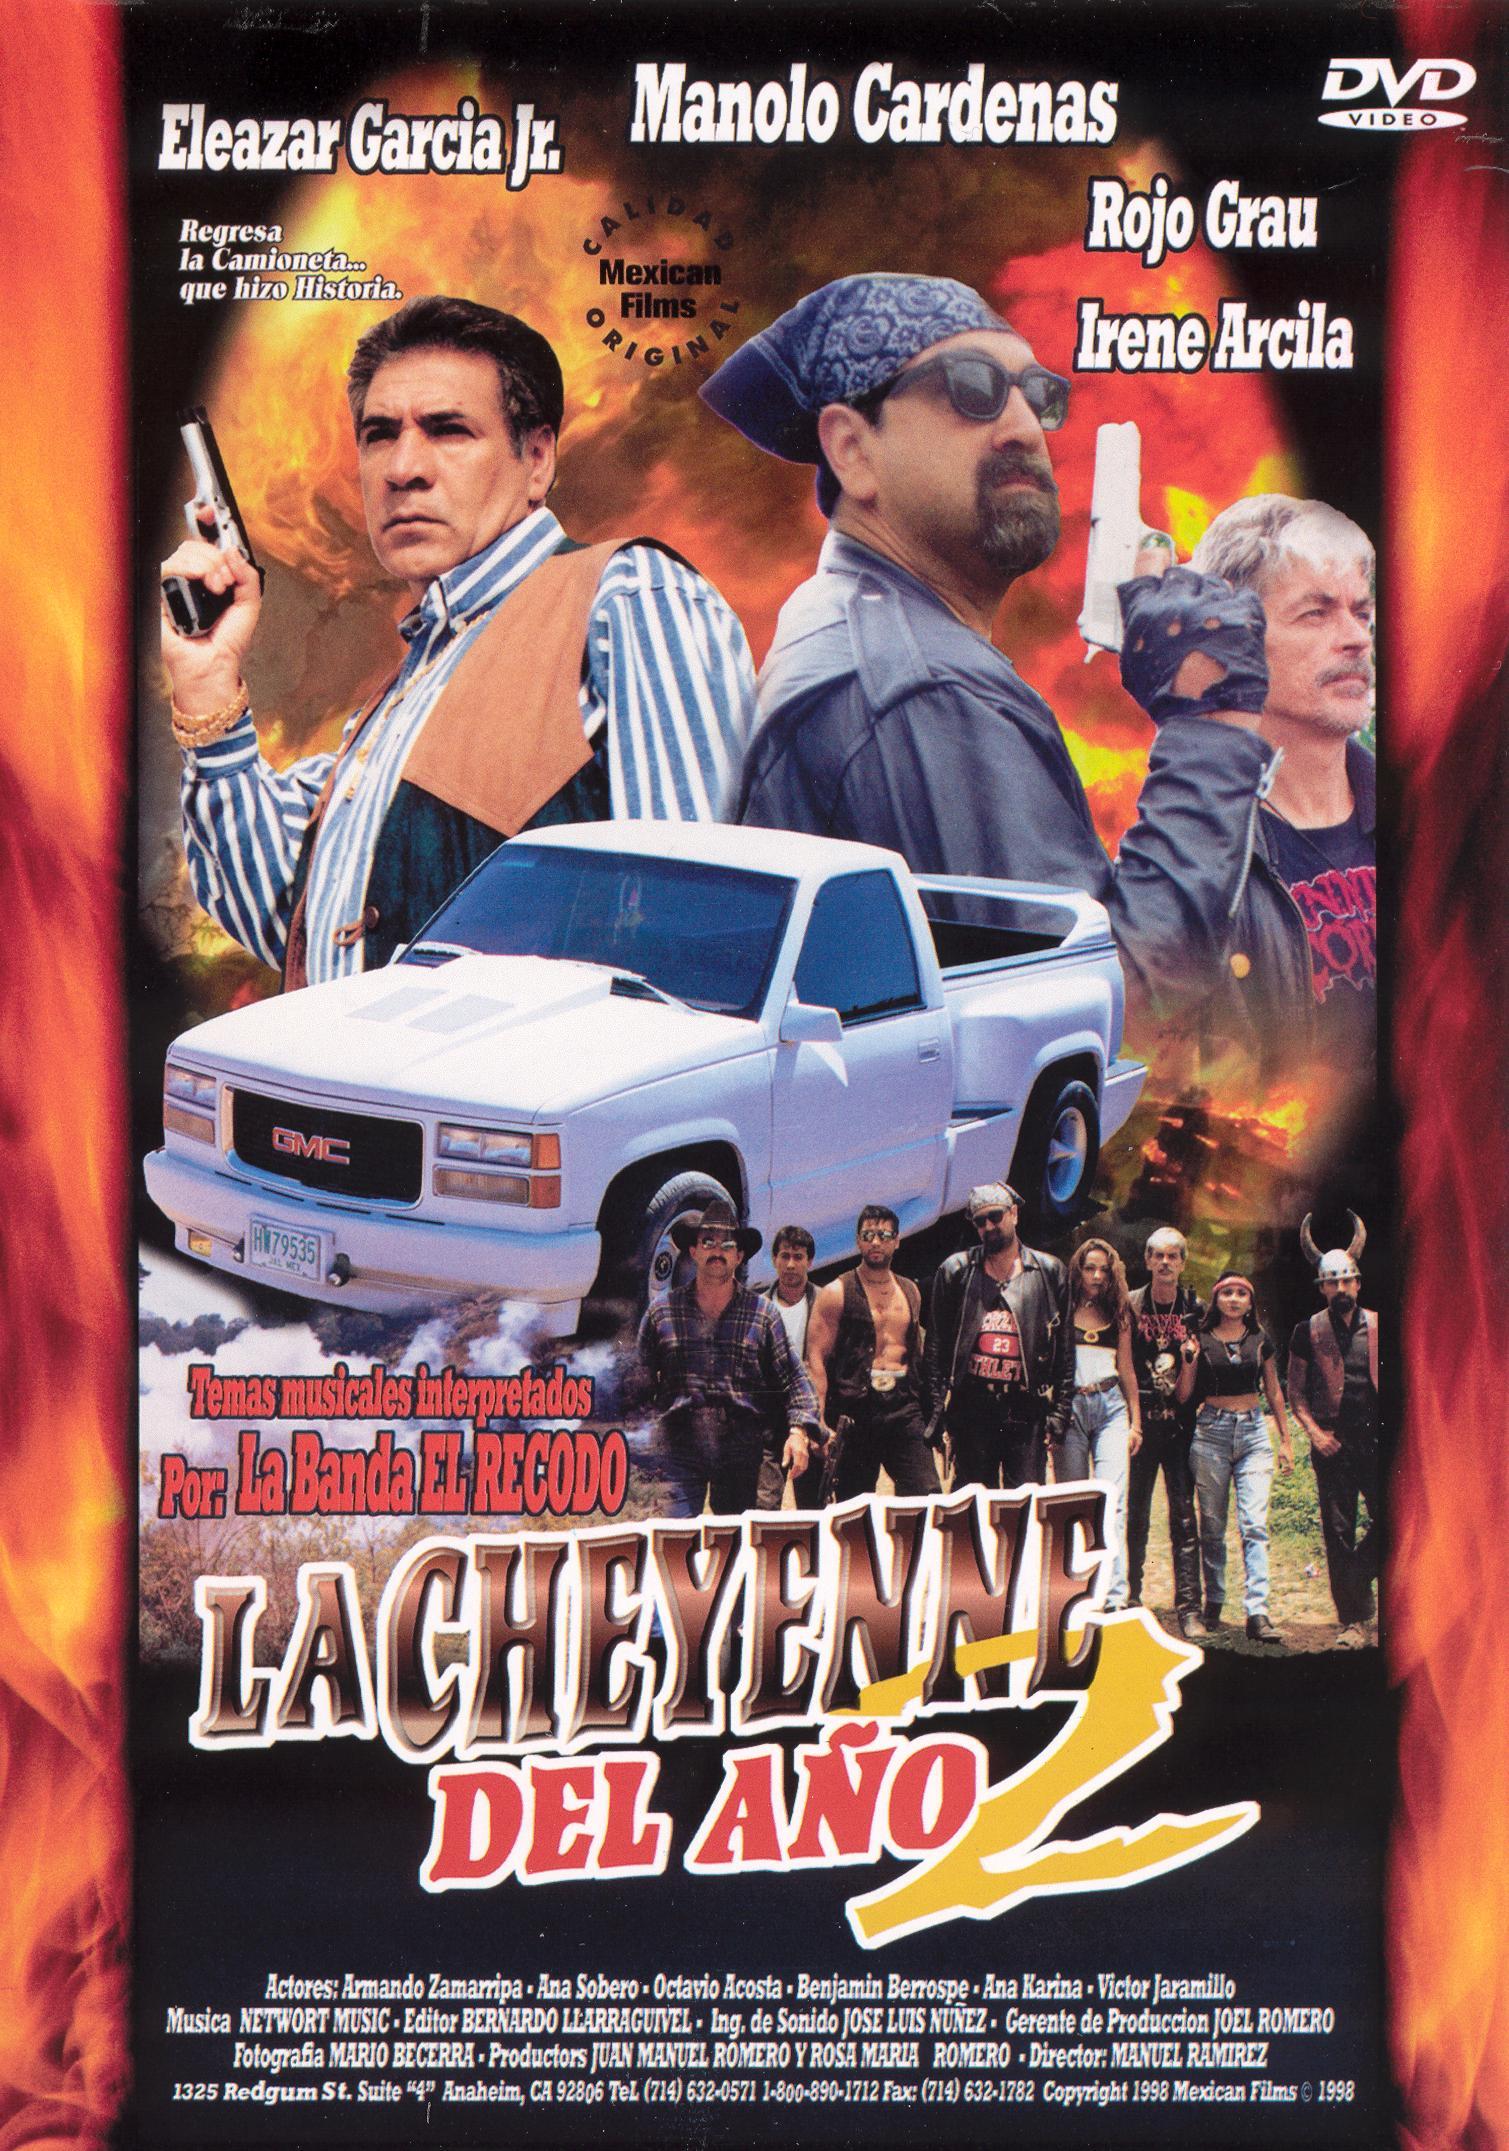 La Cheyenne Del Ano 2